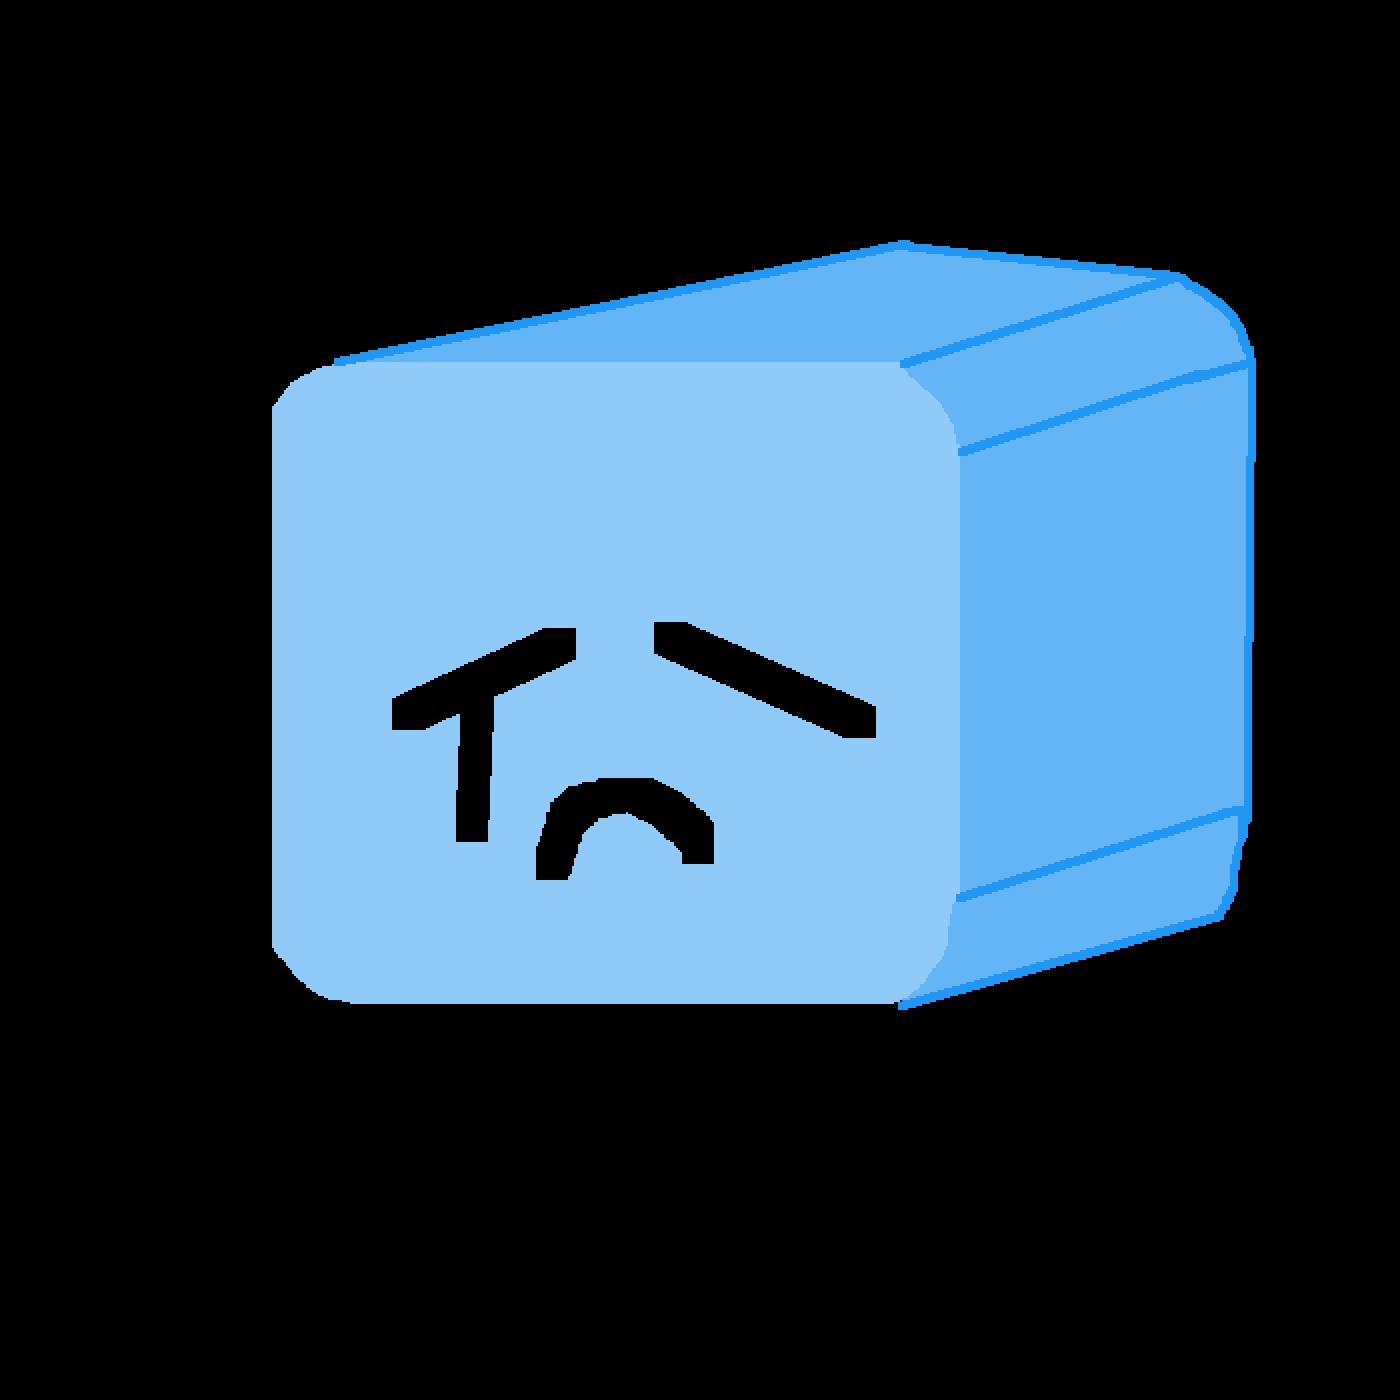 3D The Big Cube by Tenshilixu